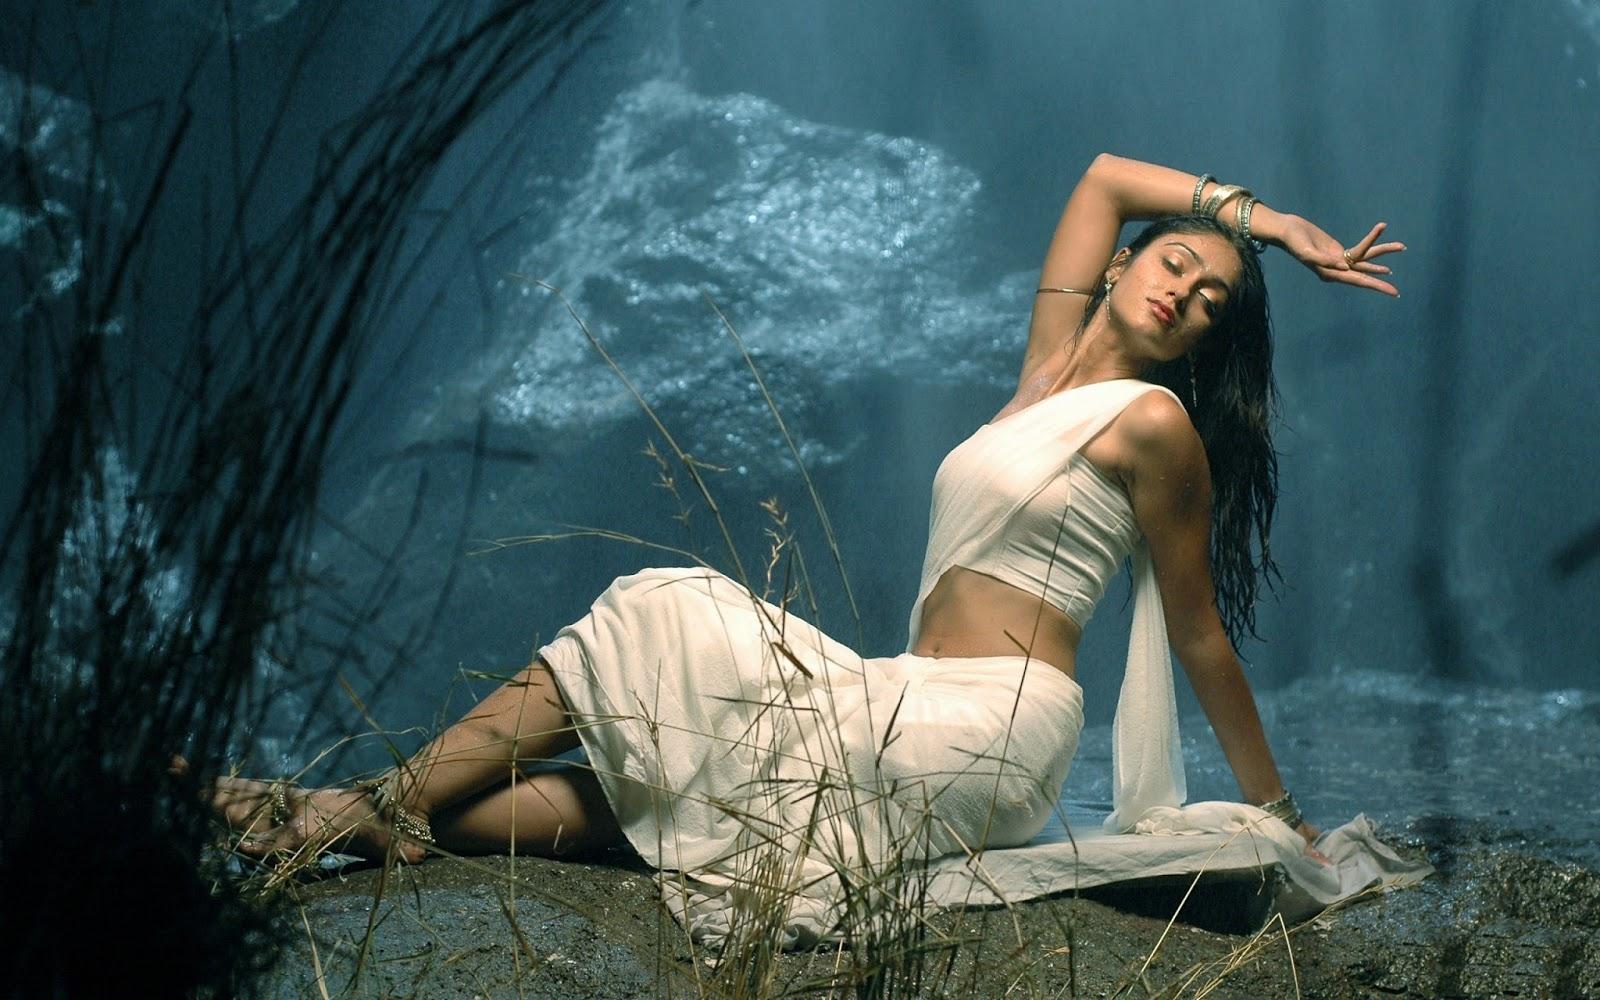 Glamorous Ileana D'Cruz in Saree Hot Photoshoot